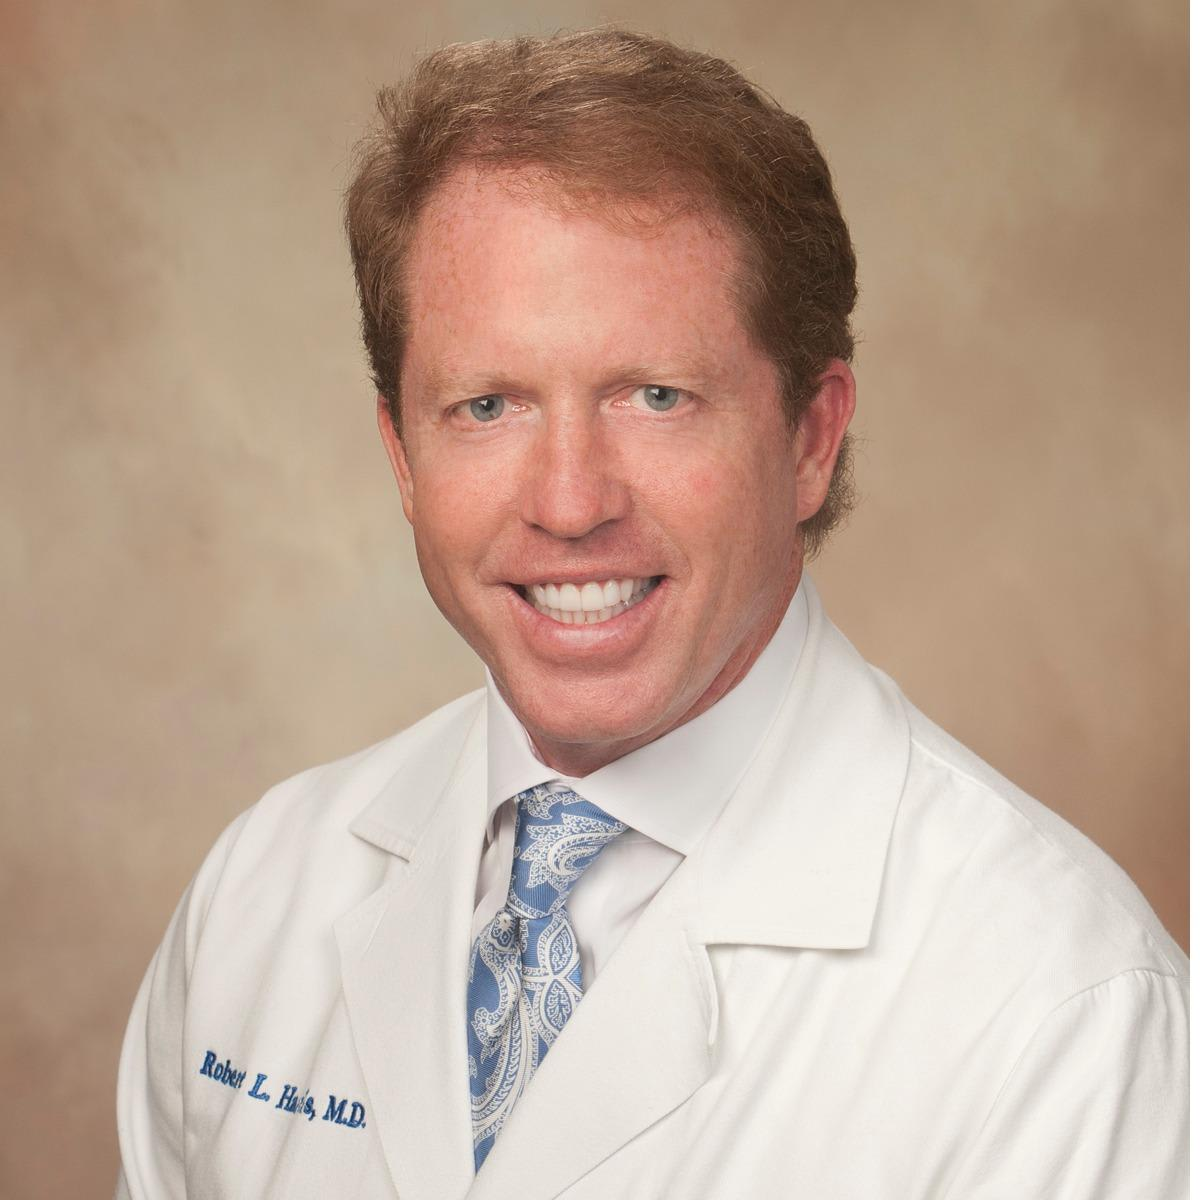 Robert L Harris, MD General Surgery